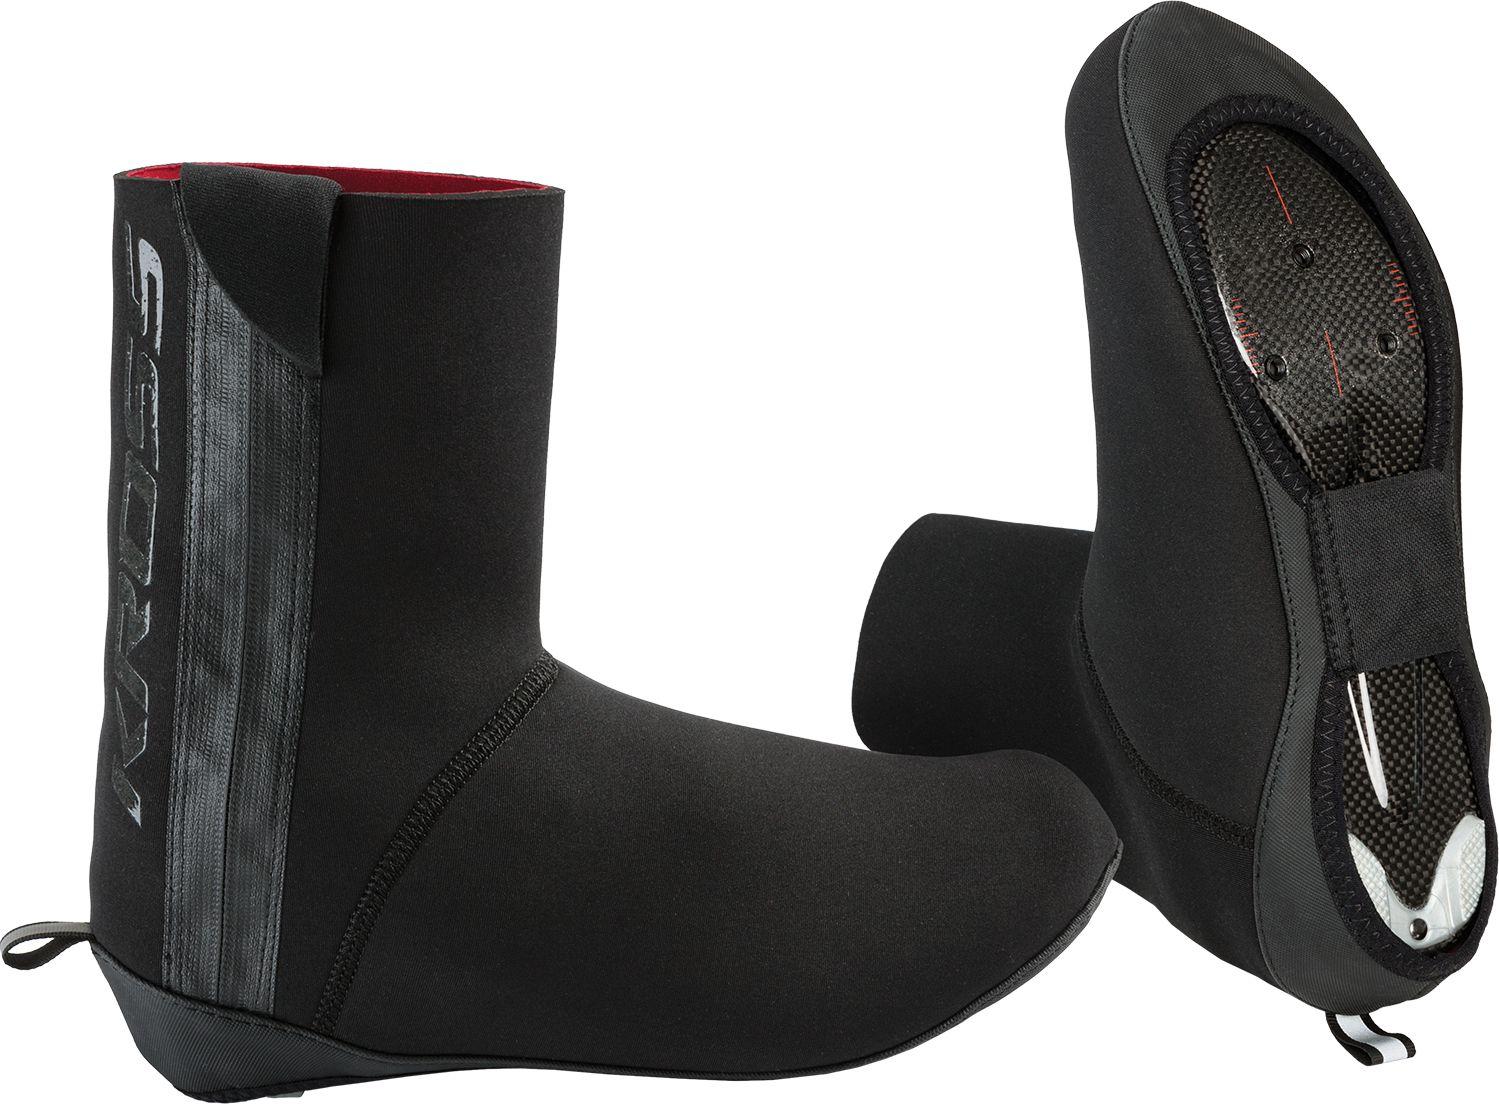 Ochraniacze na buty Kross Winter Cover S czarne